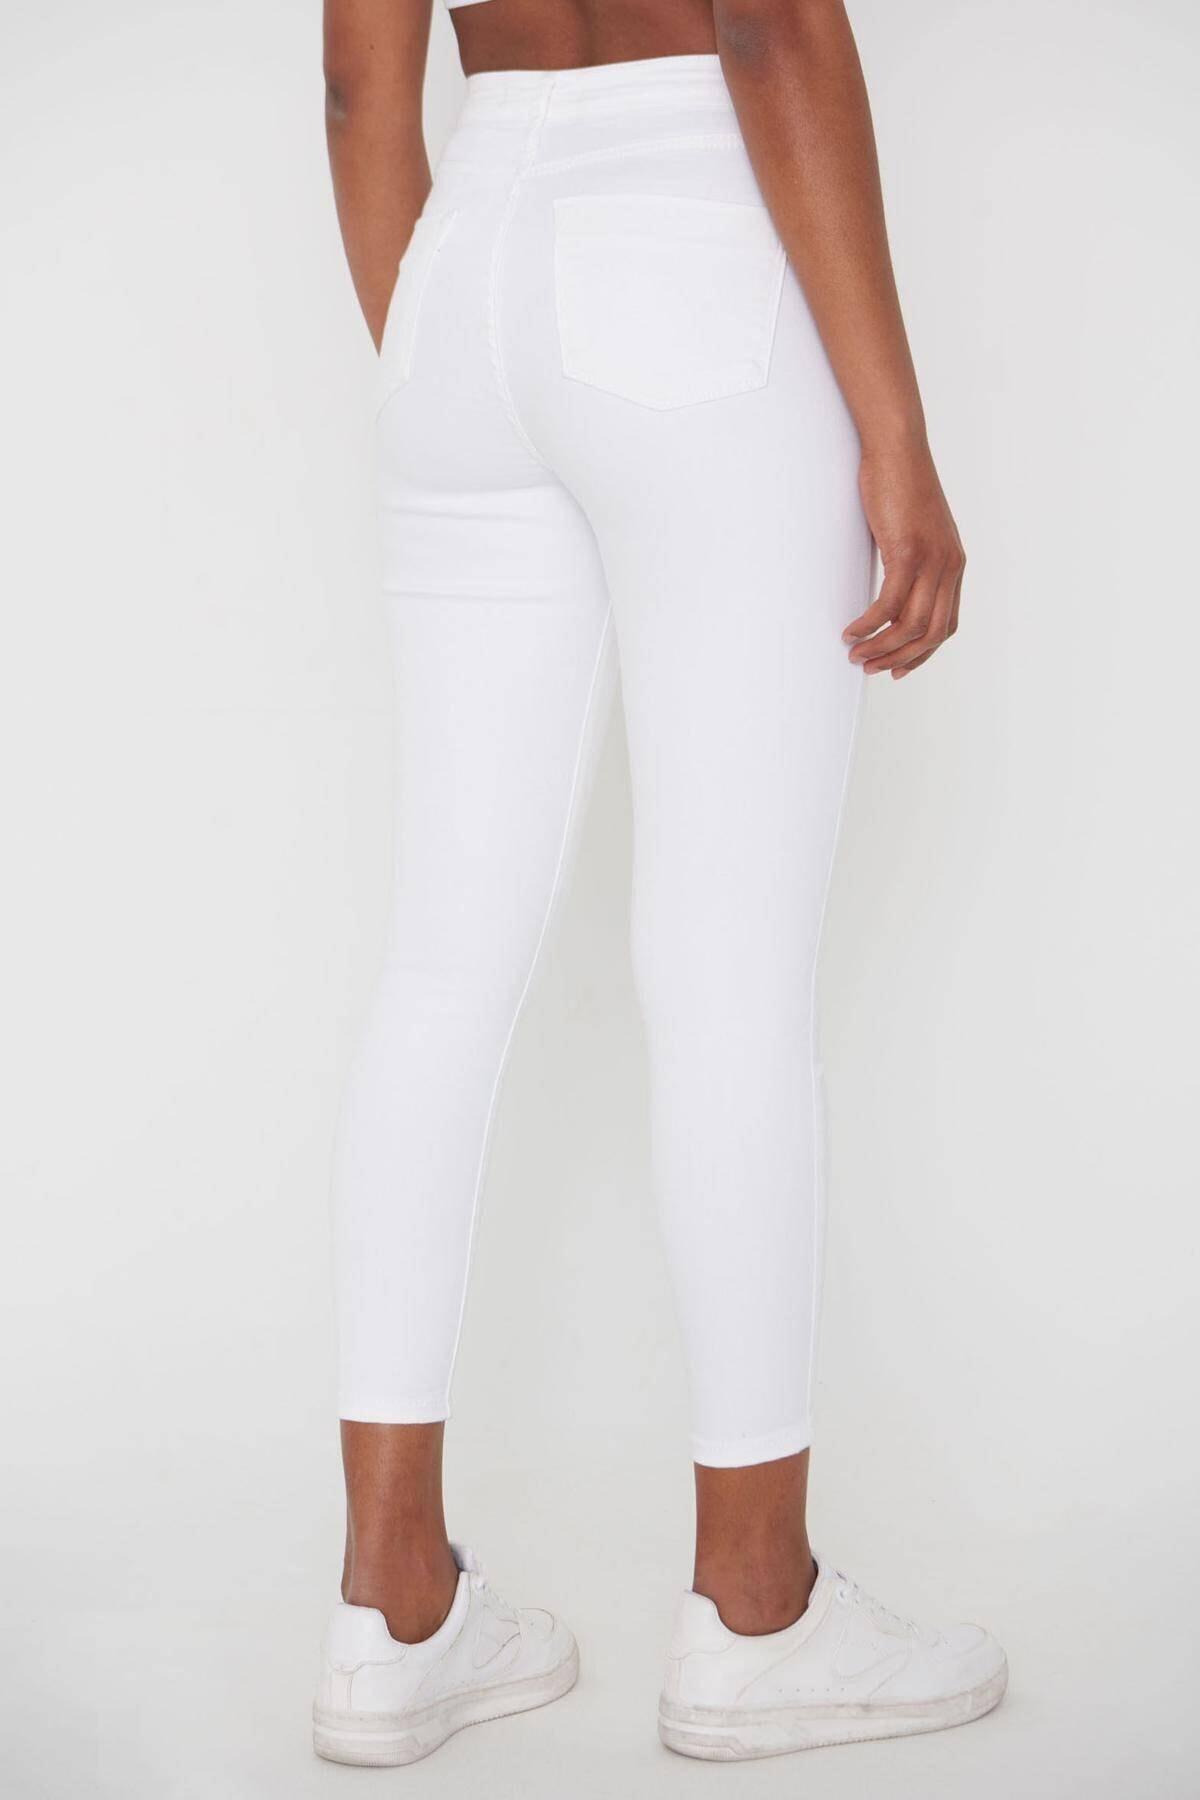 Addax Kadın Beyaz Pantolon Pn4424 - Pnj ADX-00008543 4